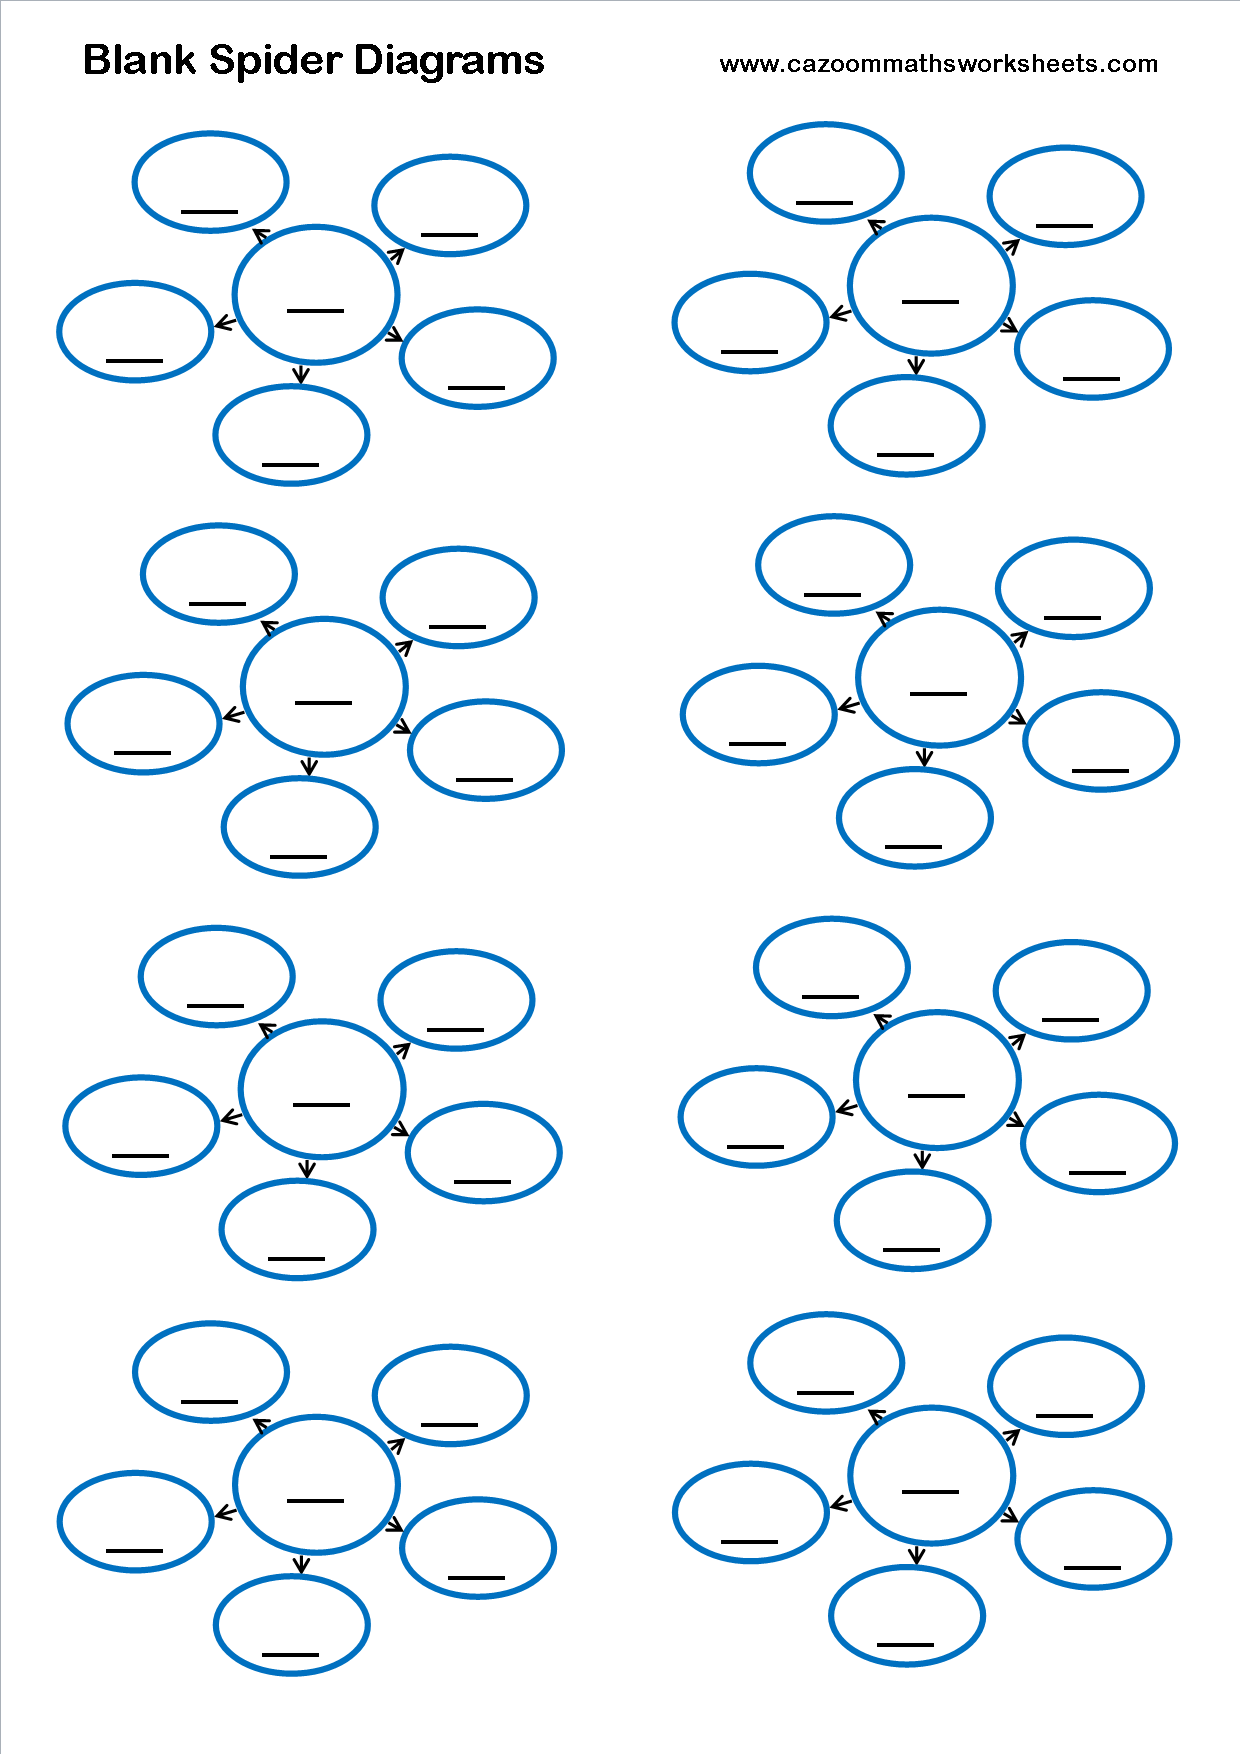 Predownload: Blank Spider Diagrams Math Worksheet Math Resources Math Worksheets [ 1754 x 1240 Pixel ]